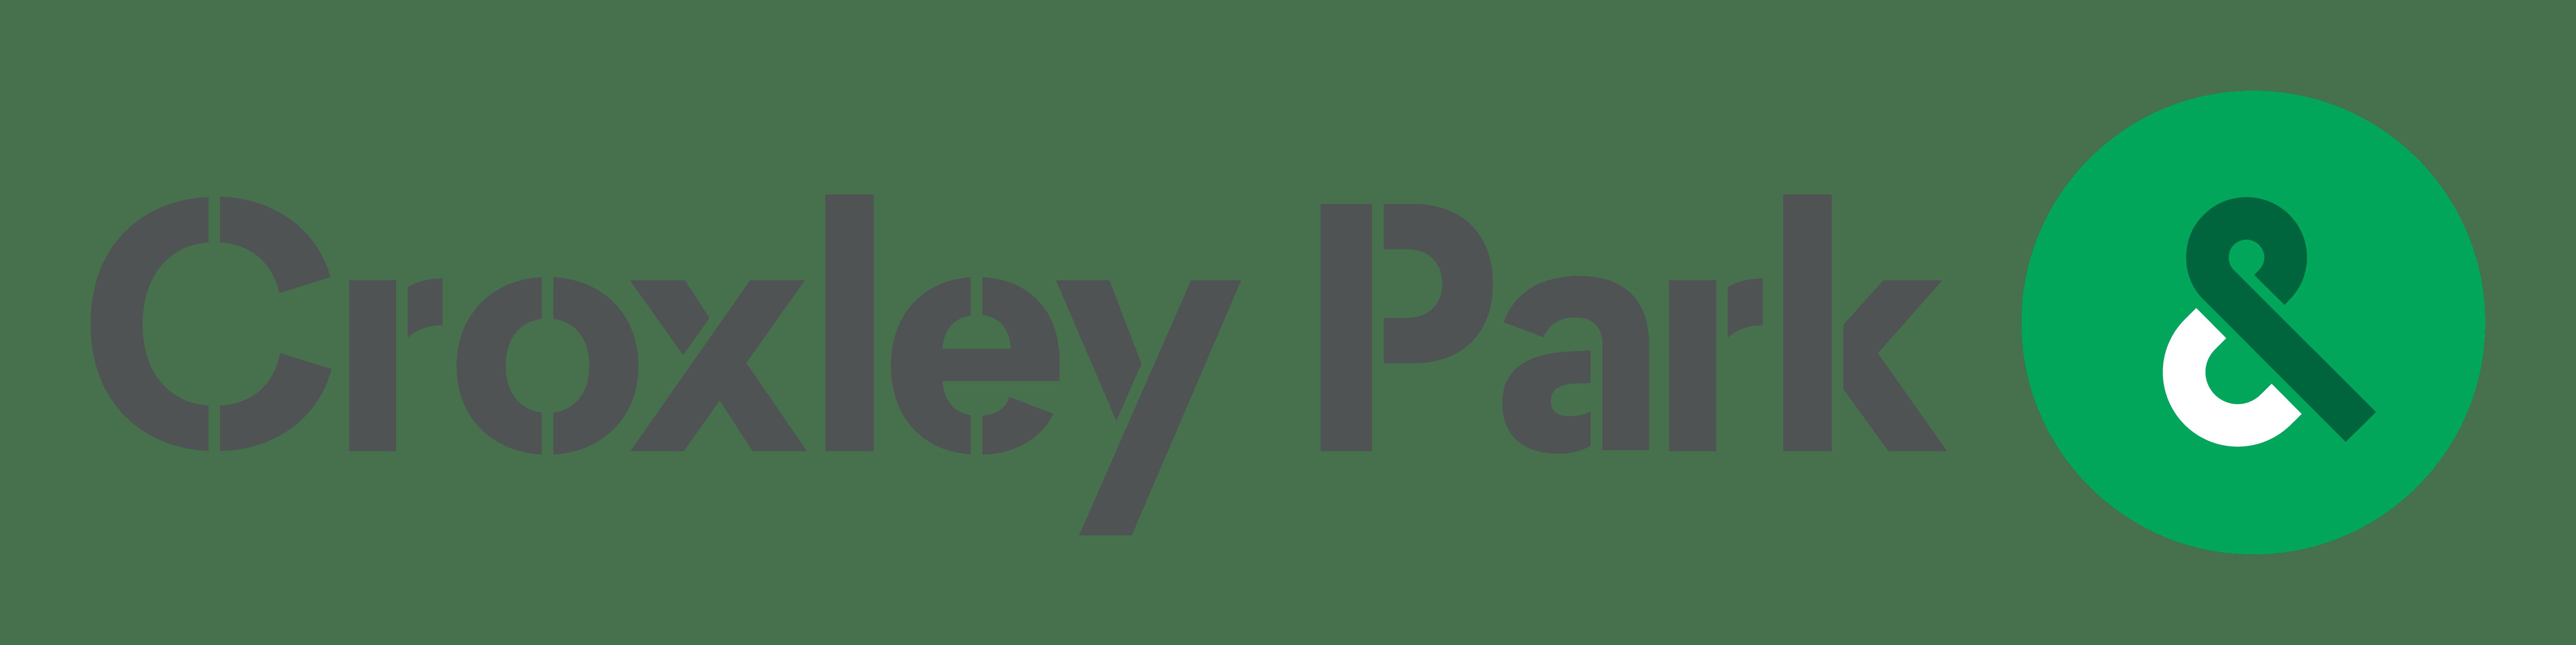 Croxley Park Logo